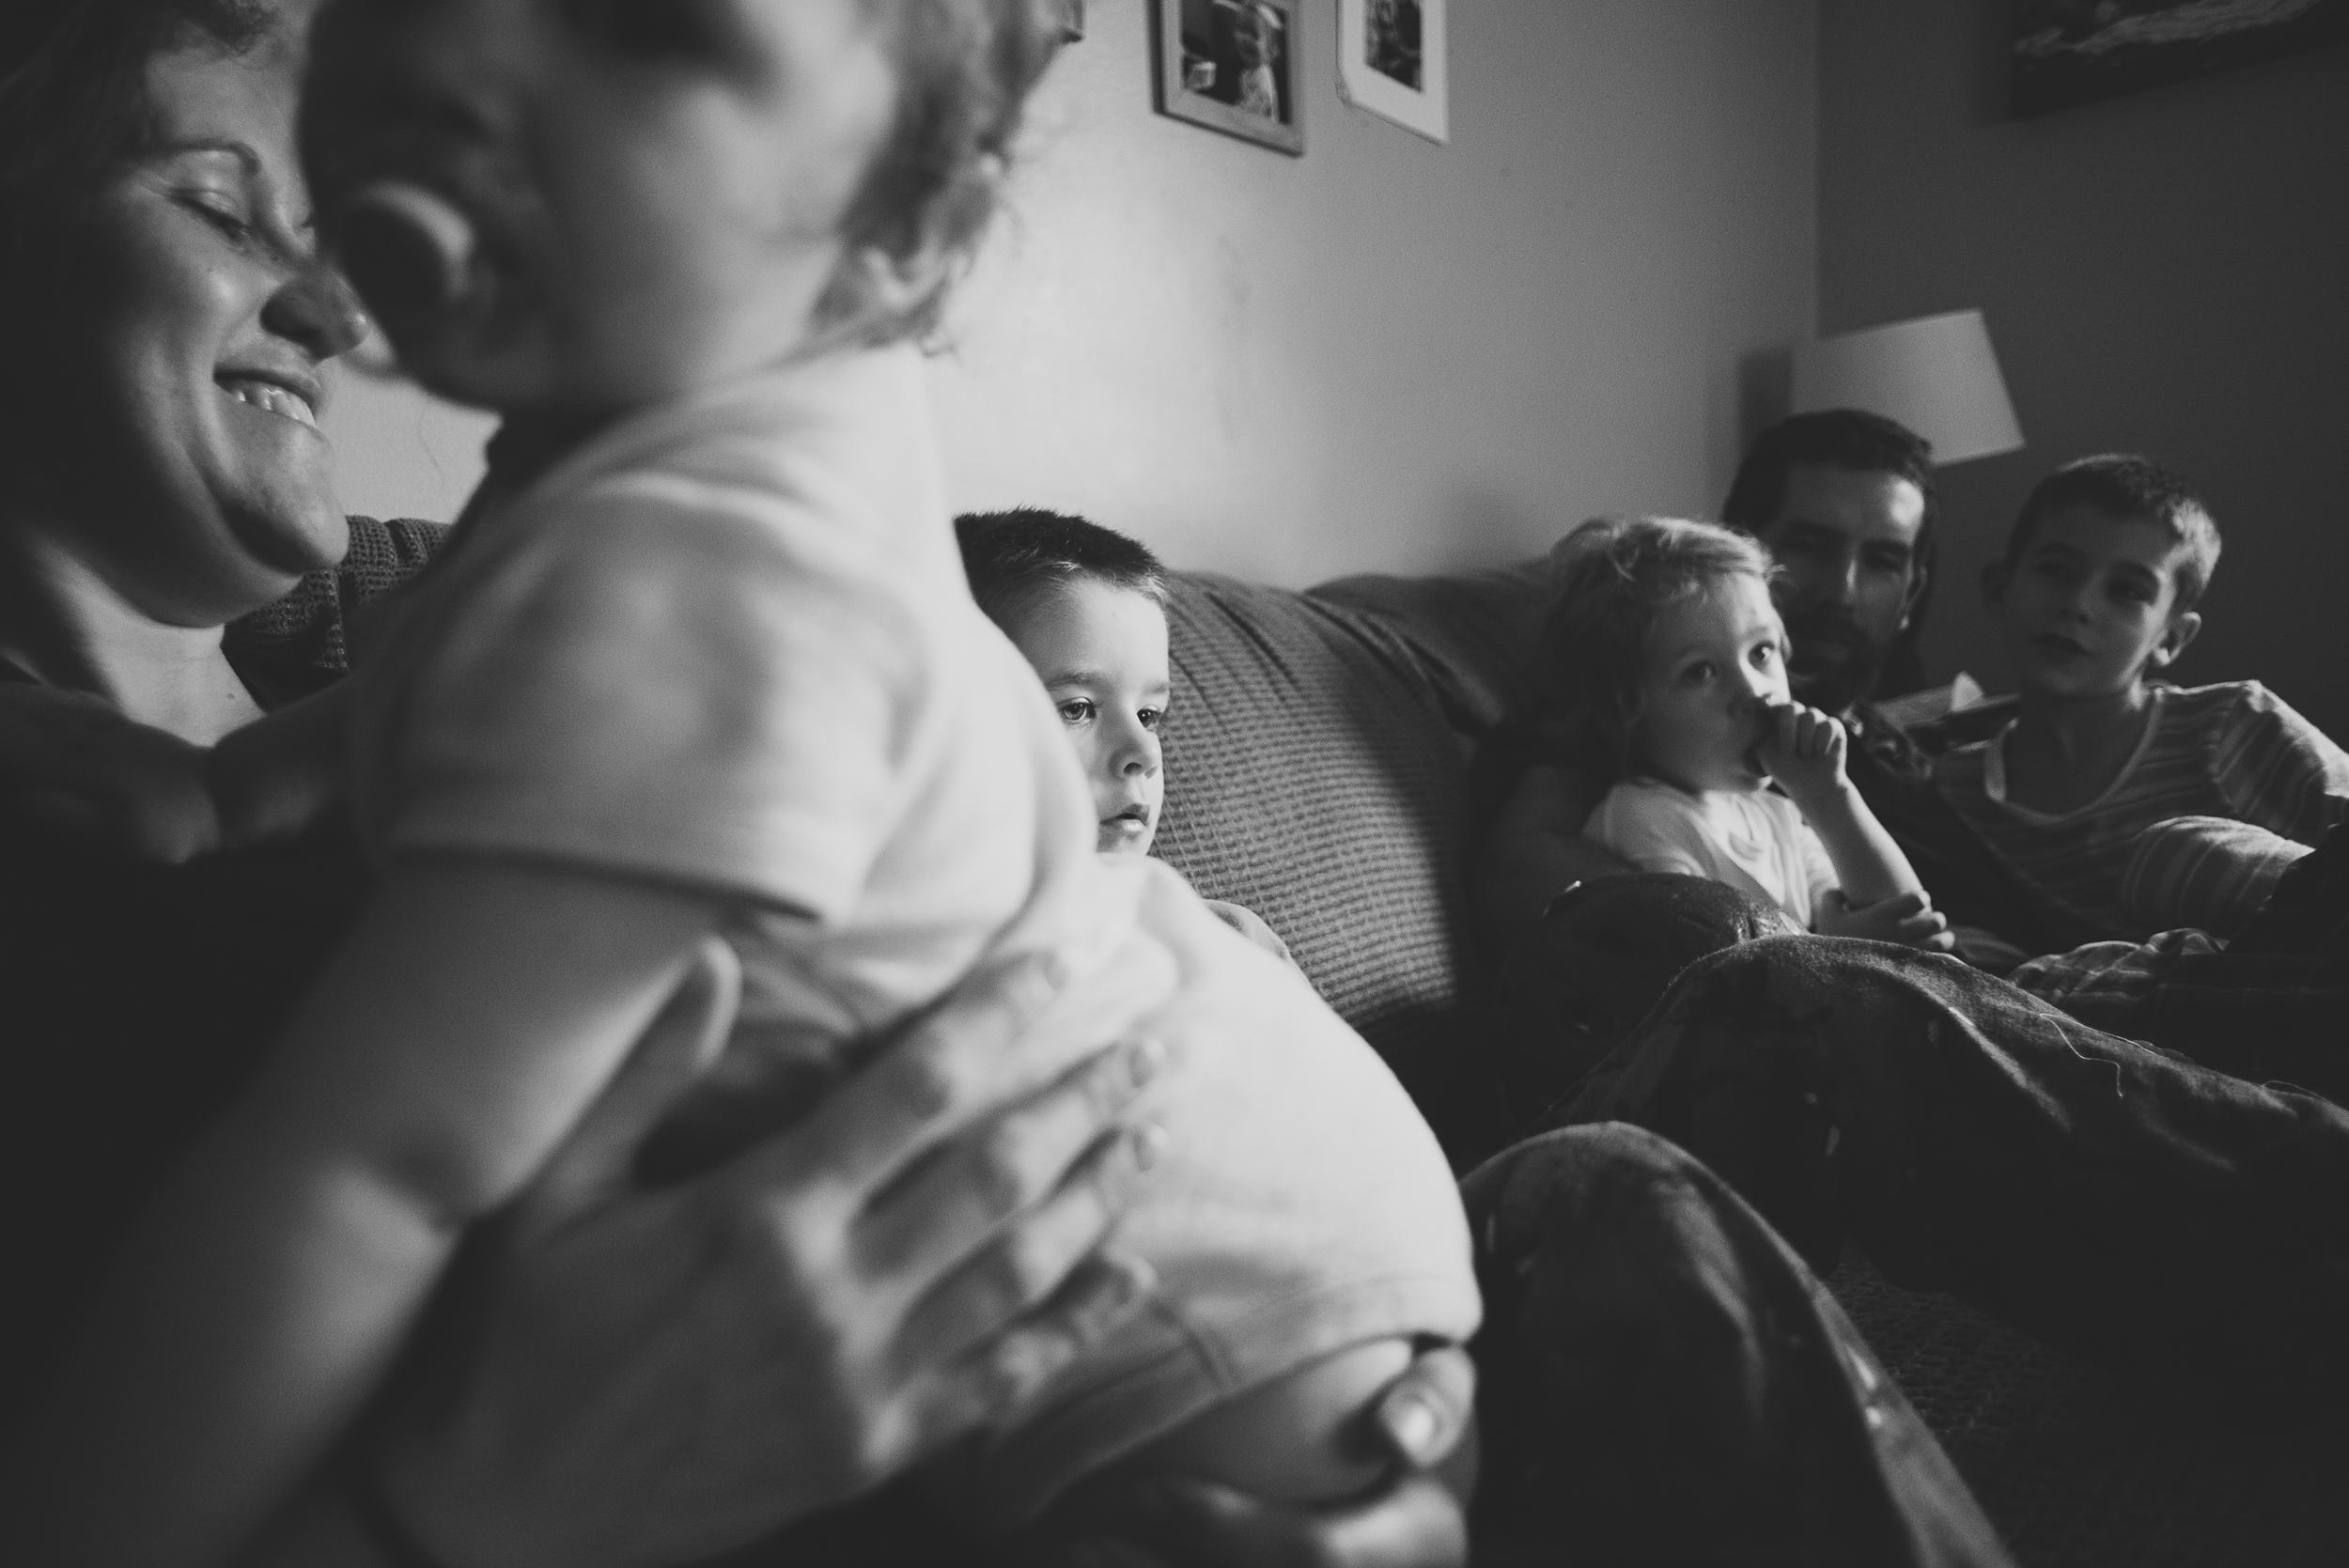 dan-jess-family-on-sofa-7.jpg